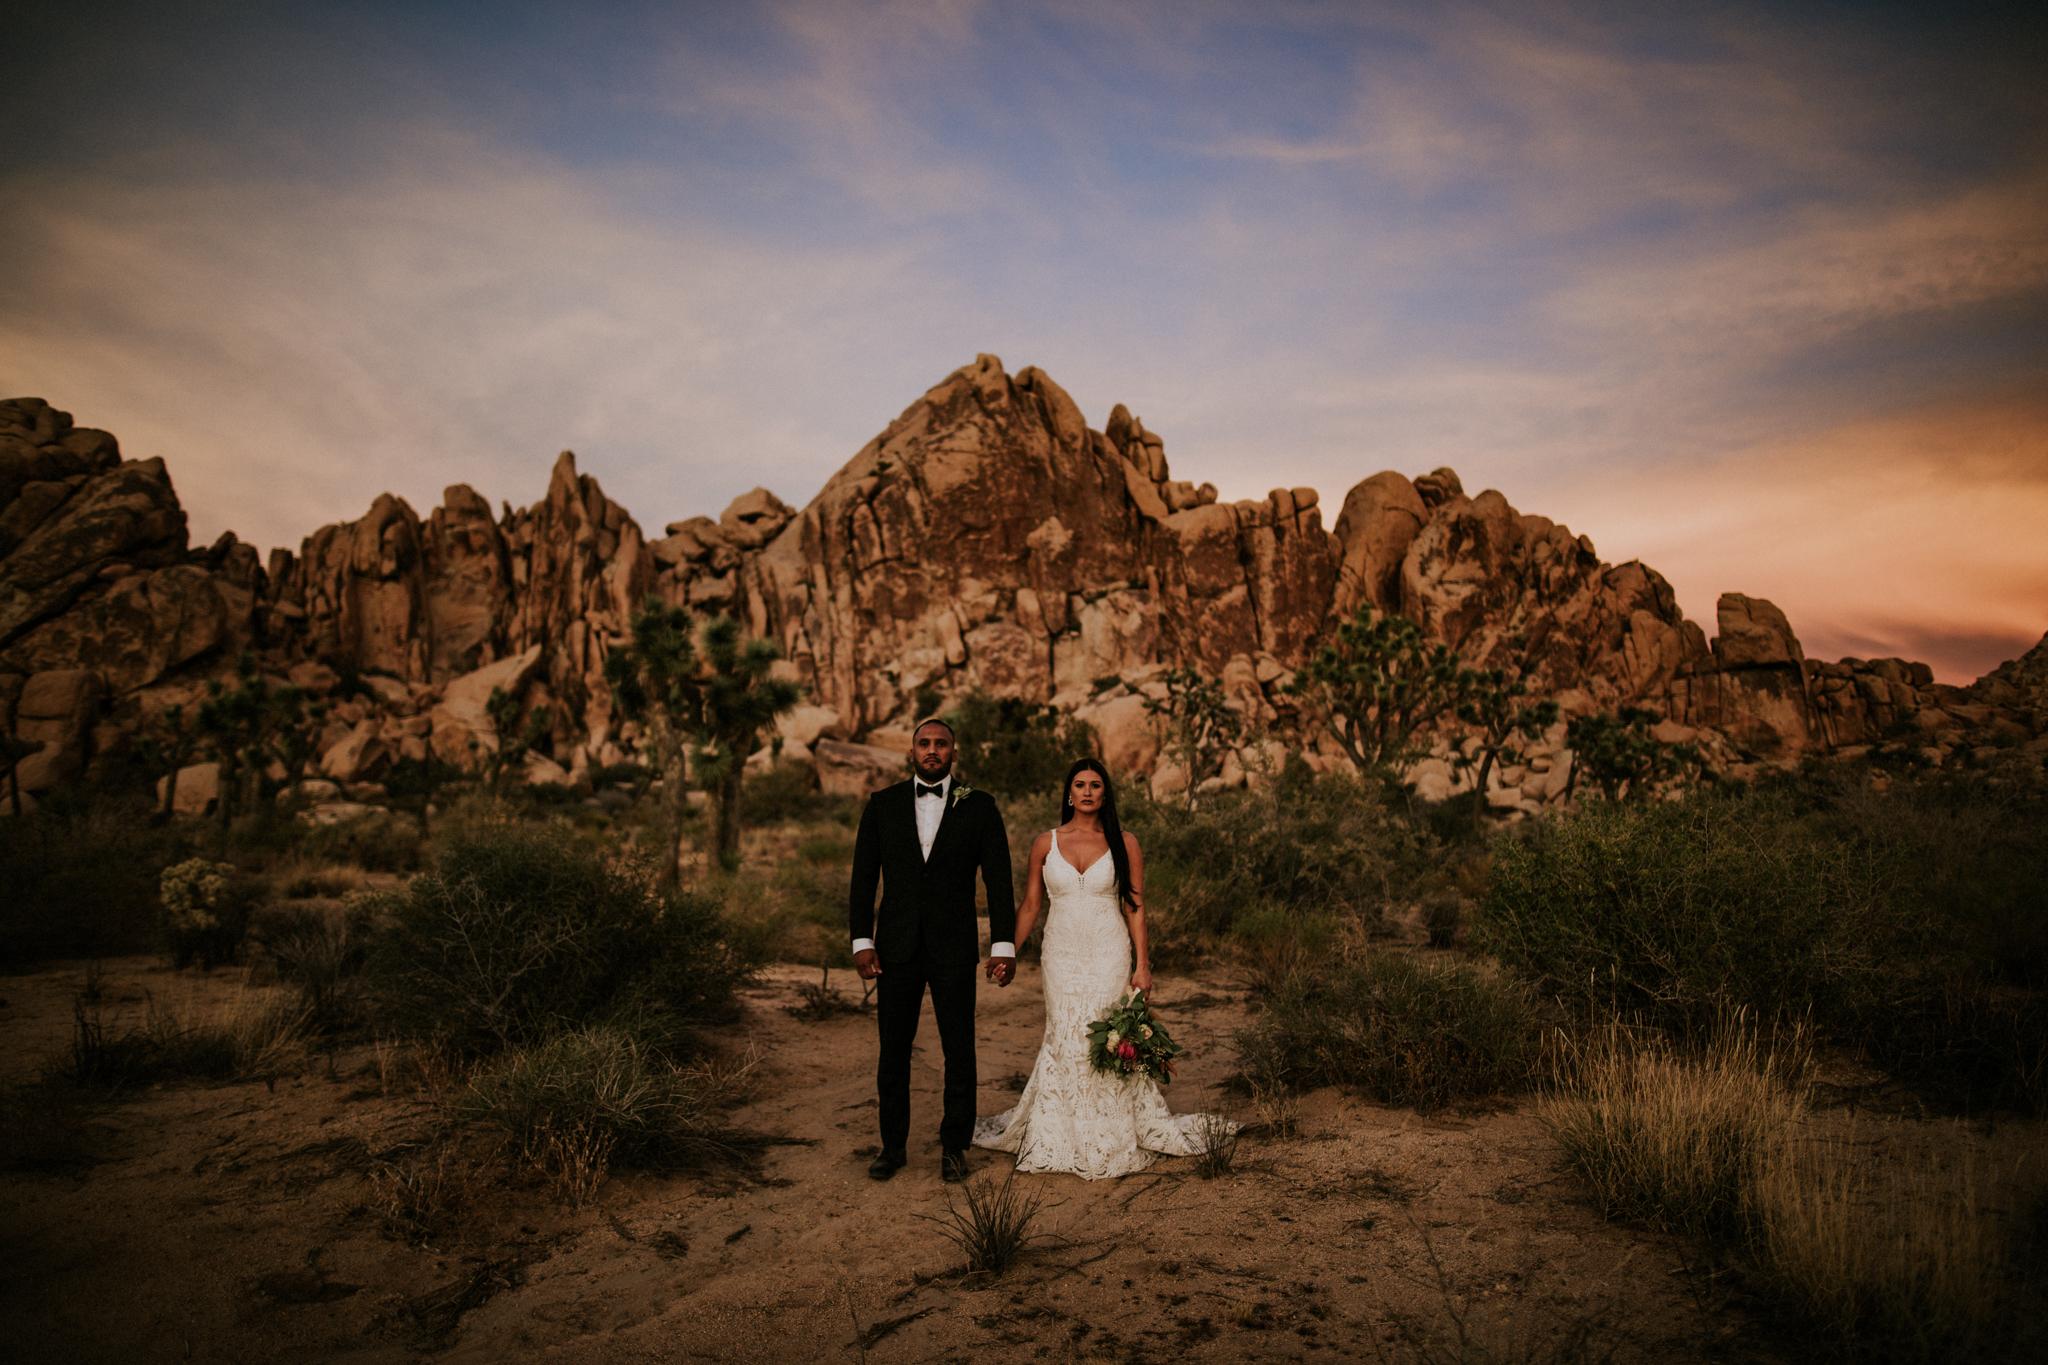 Amanda + Hass | Joshua Tree National Park | Elopement Photo + Video